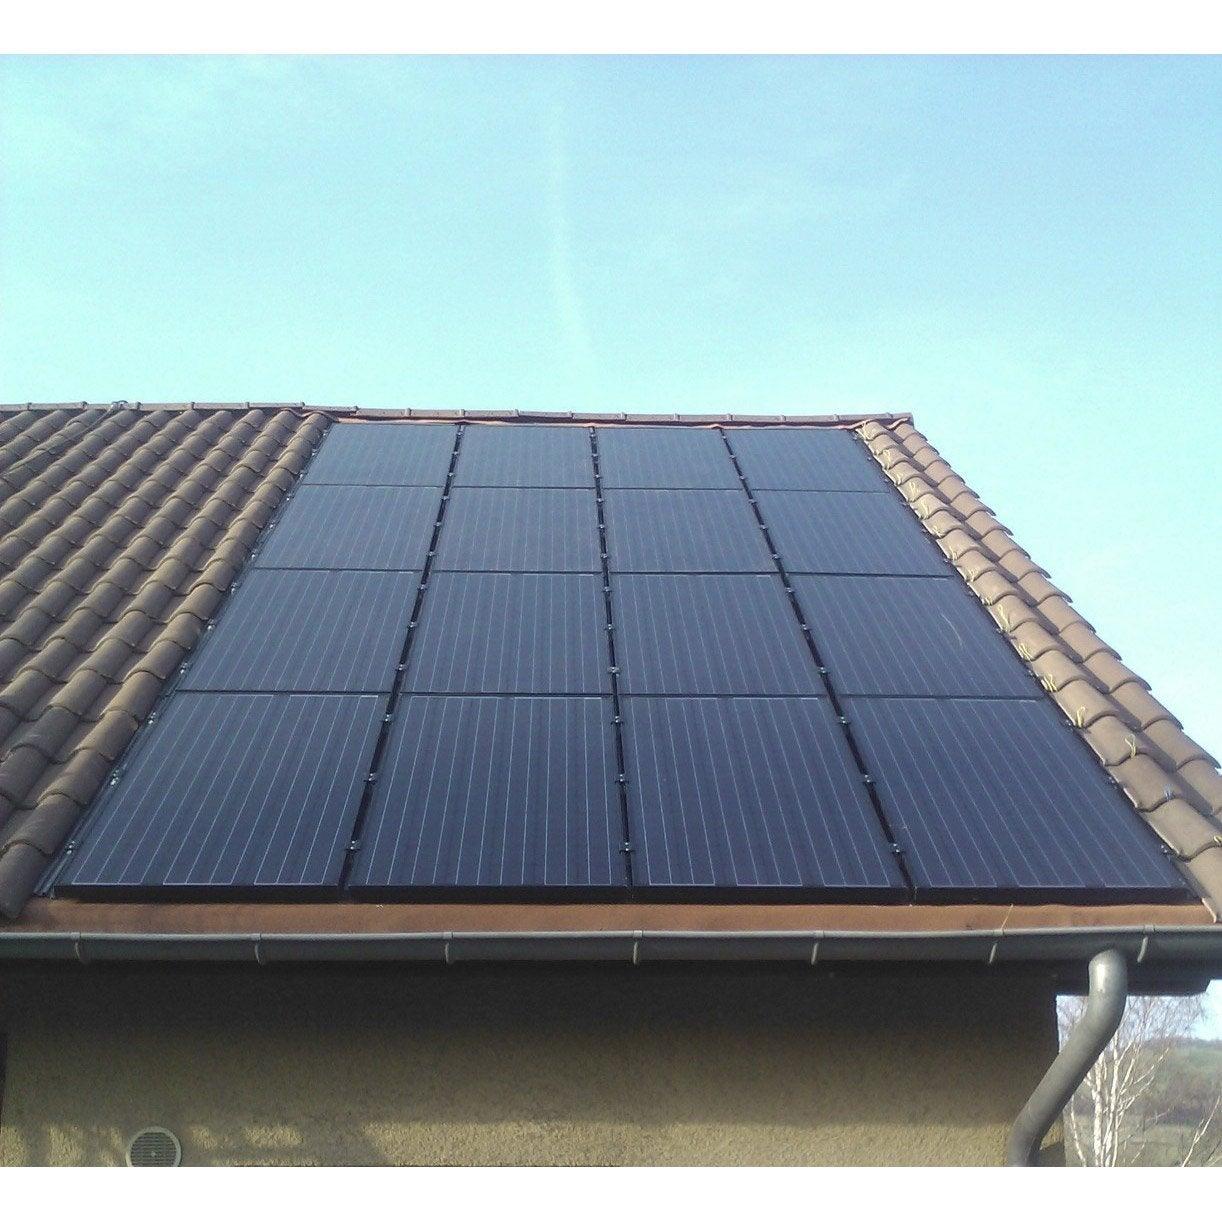 kit solaire photovolta que premium int gr watt home 8820w leroy merlin. Black Bedroom Furniture Sets. Home Design Ideas